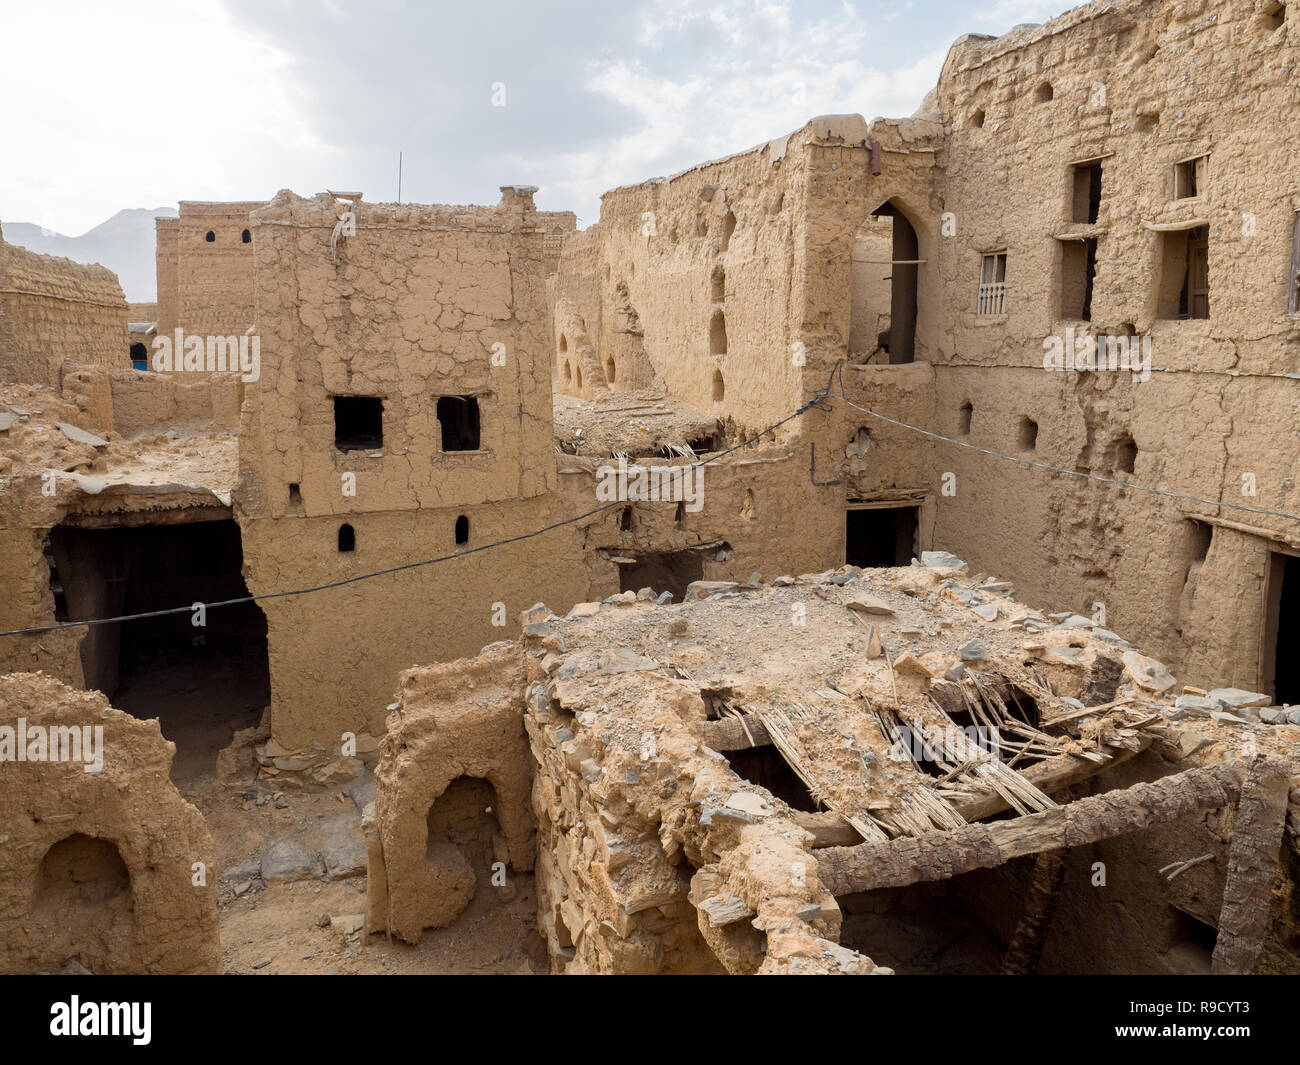 Panoramic view of several ancient mud brick houses ruins in Al Hamra, Oman - Stock Image